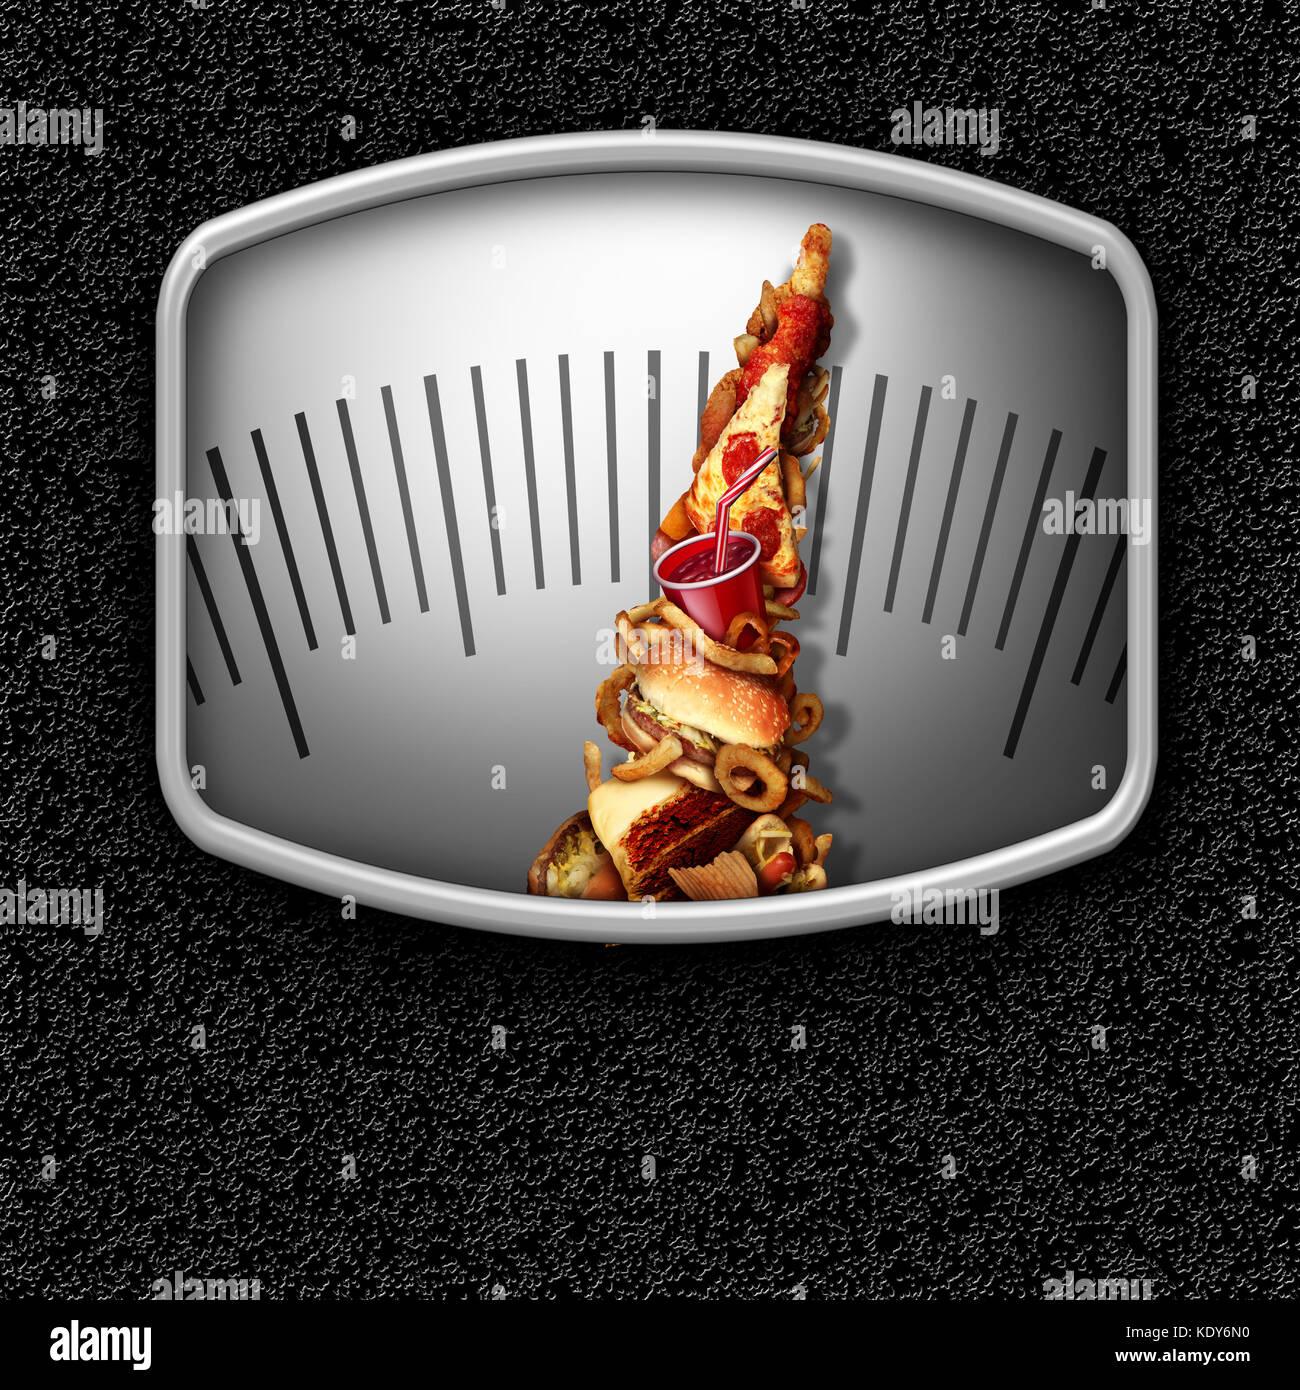 Báscula de comida chatarra como insalubres snacks con forma de aguja de indicación de medición como Imagen De Stock